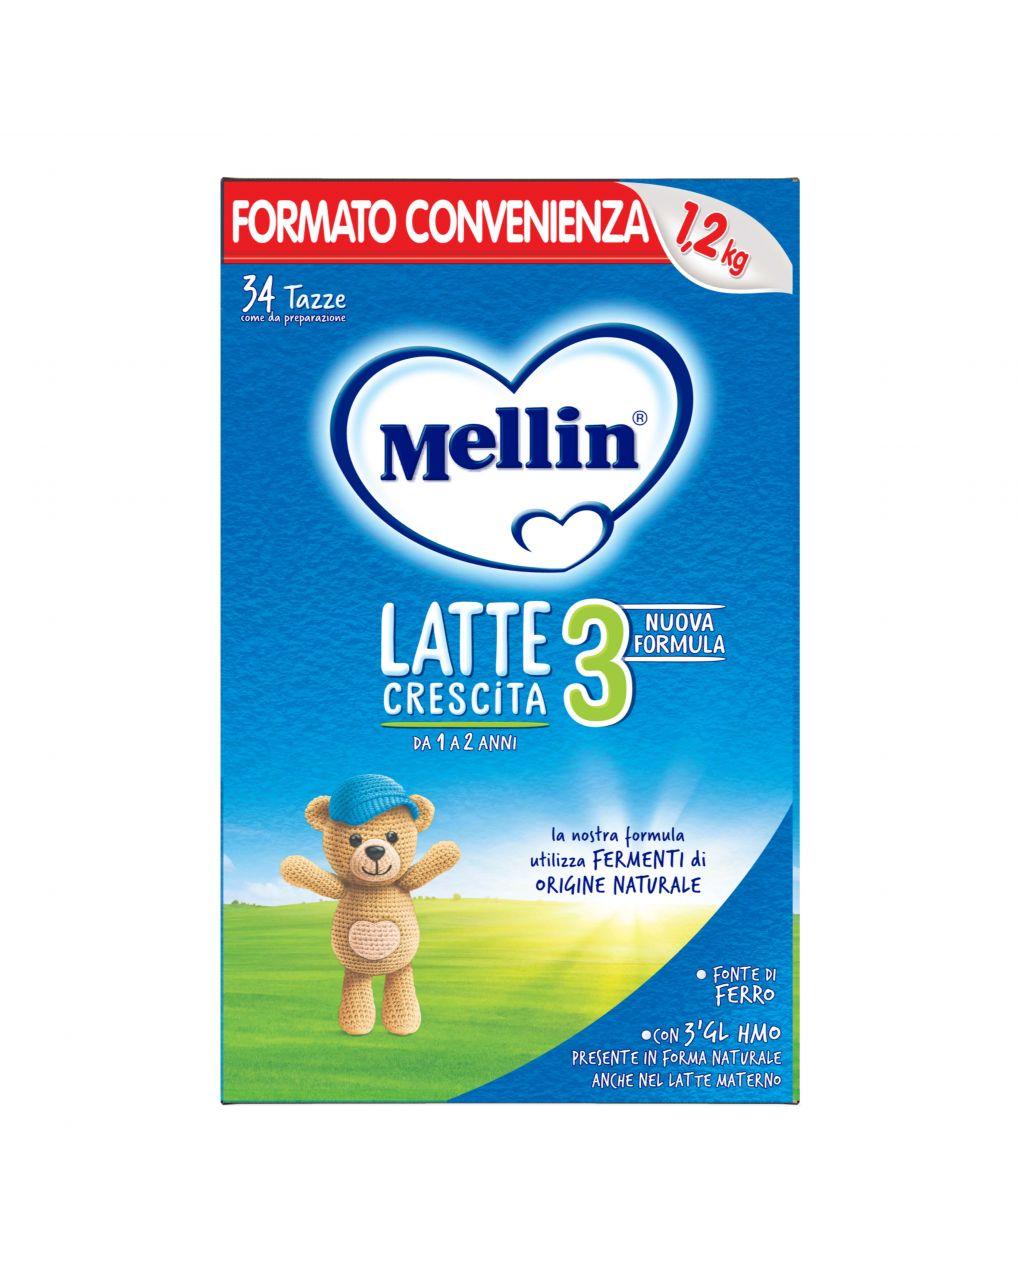 Mellin - latte mellin 3 polvere 1200g - Mellin